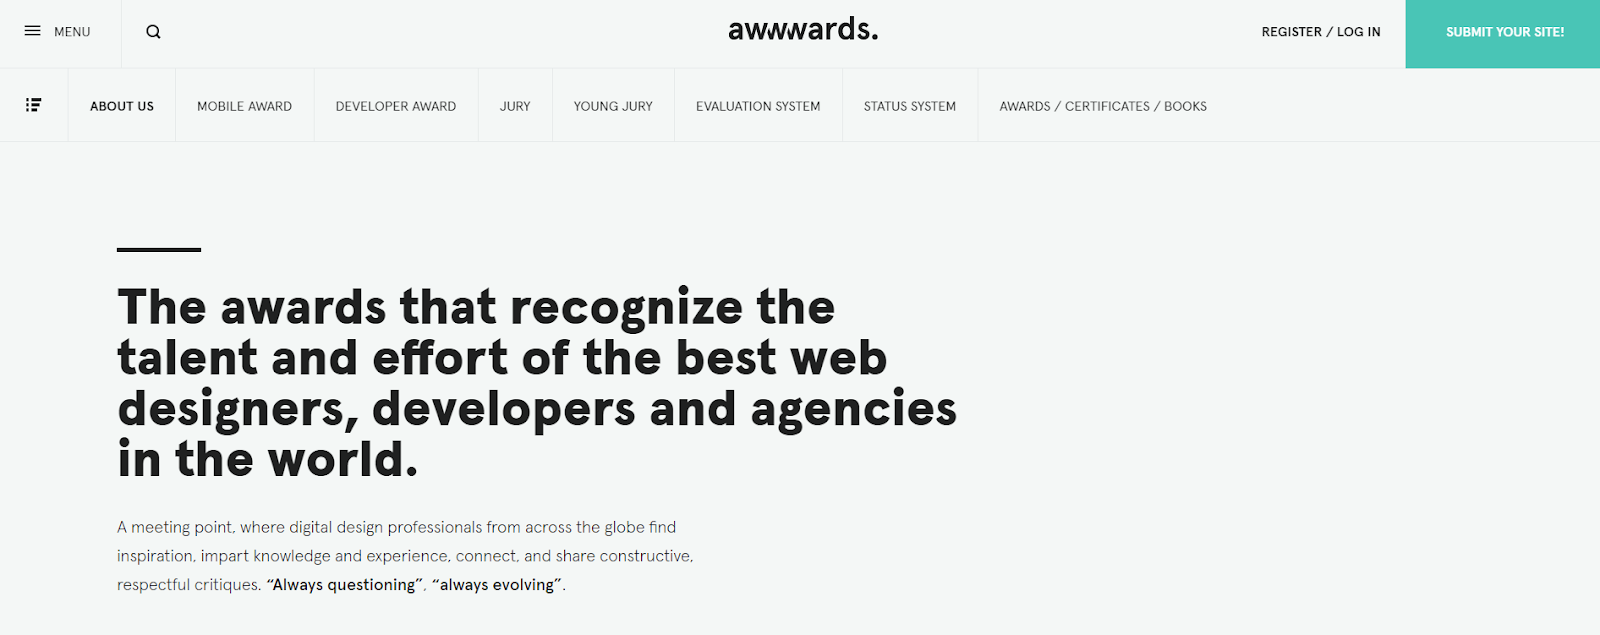 Awwwards homepage, website design ideas.